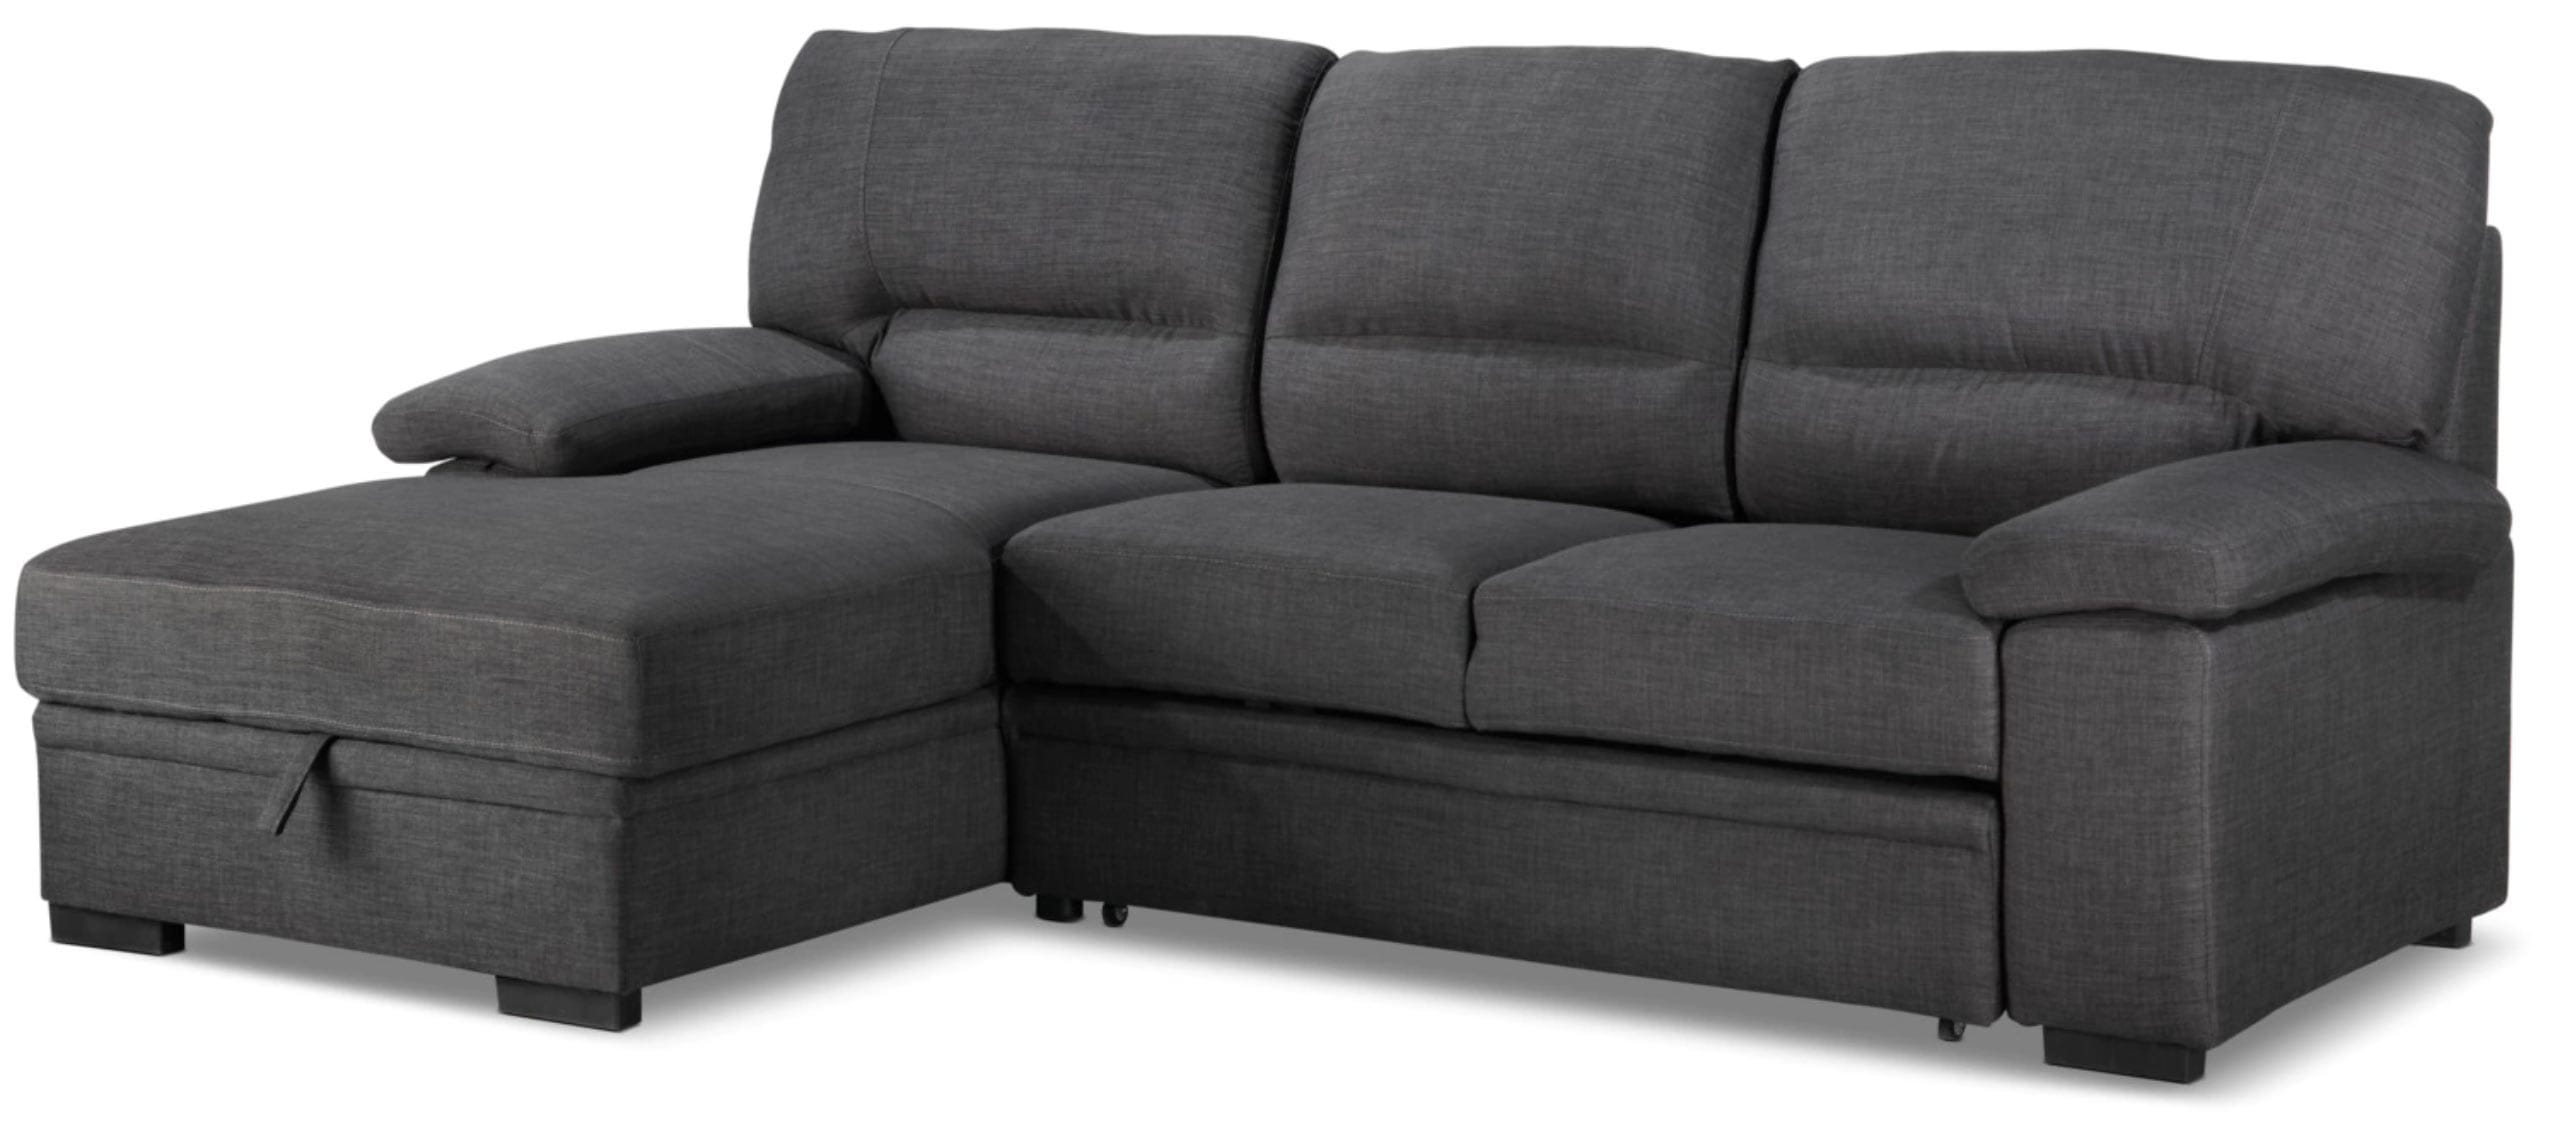 Magnificent Tessaro Sleeper Sectional Dark Gray By Primo Inzonedesignstudio Interior Chair Design Inzonedesignstudiocom